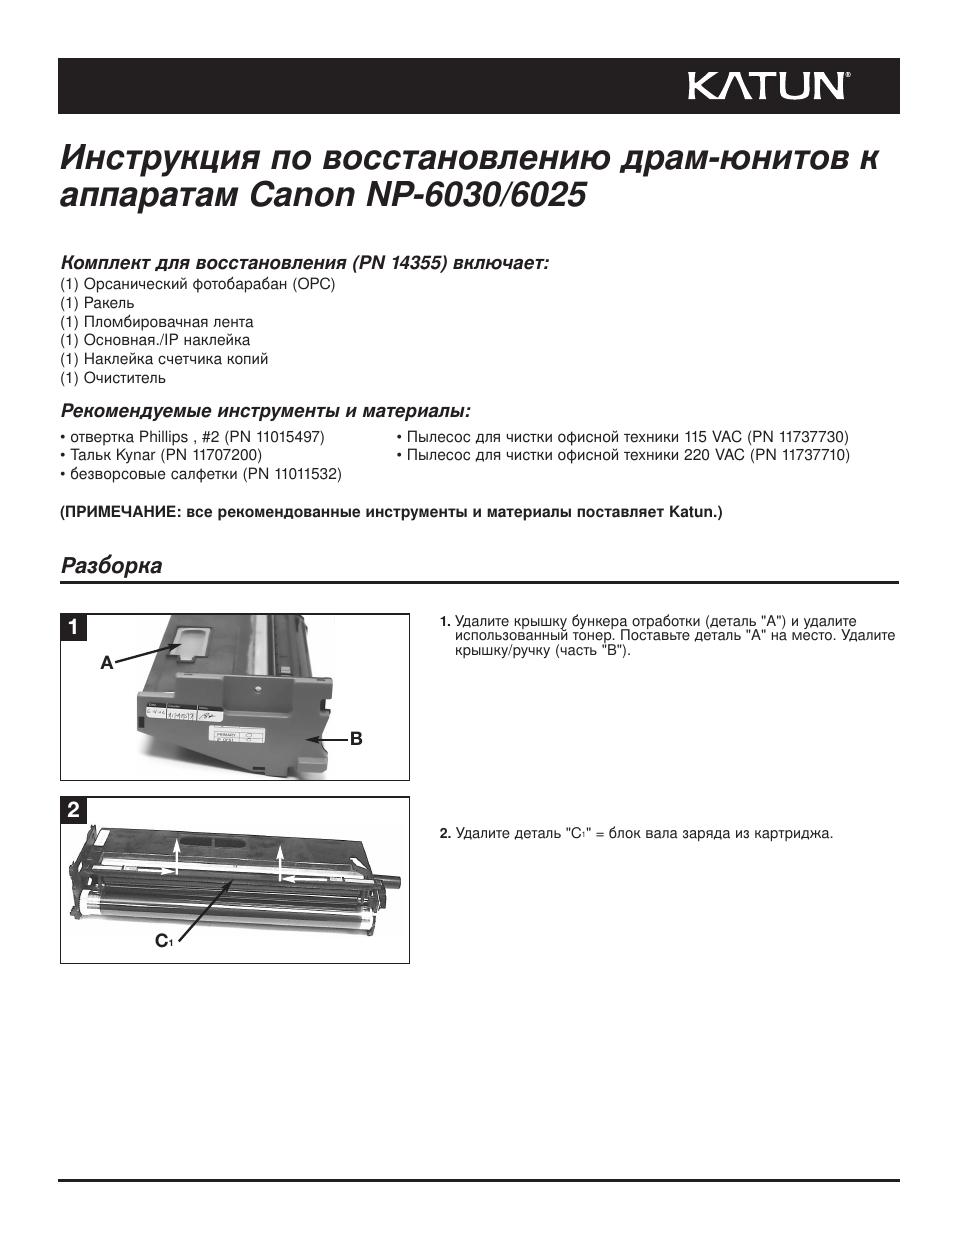 ... Array - katun canon np 6025 drum unit cartridges user manual page 10 12  rh manualsdir